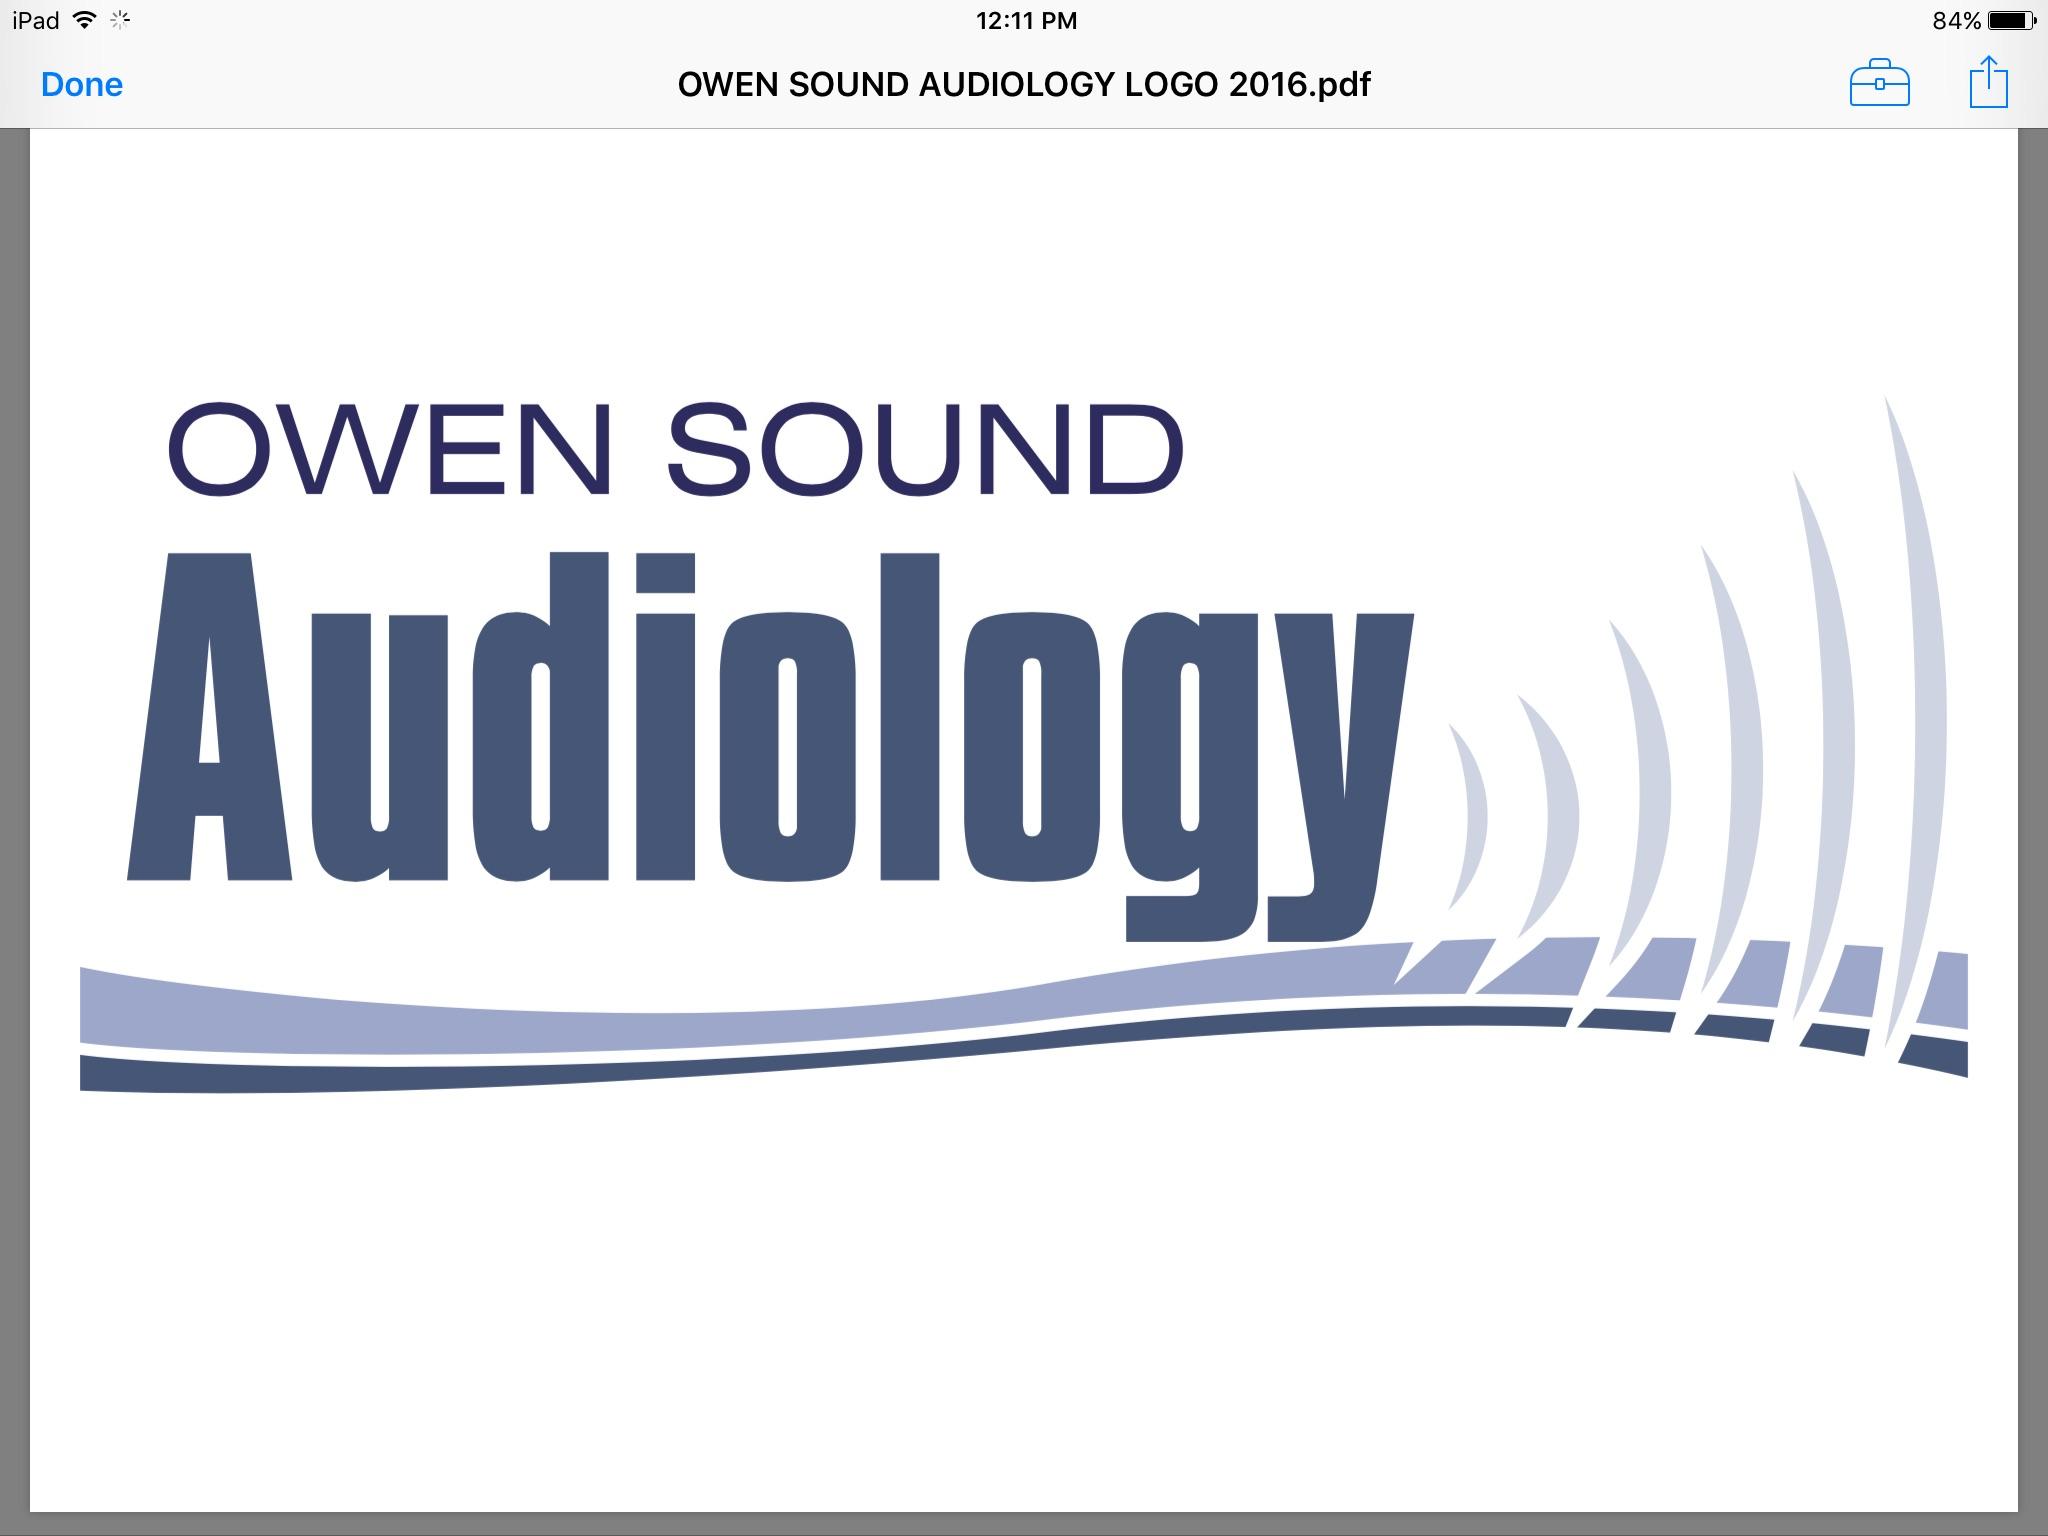 Owen Sound Audiology